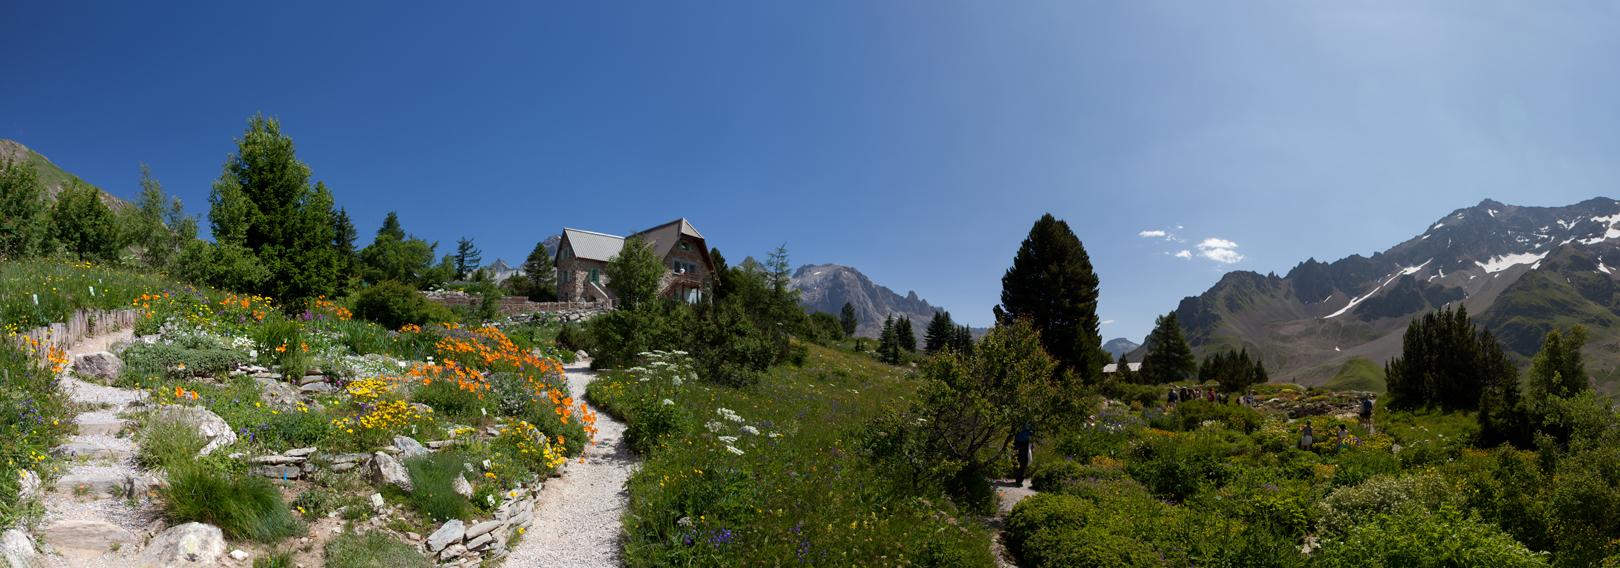 05 Jardin Alpin du Lautaret